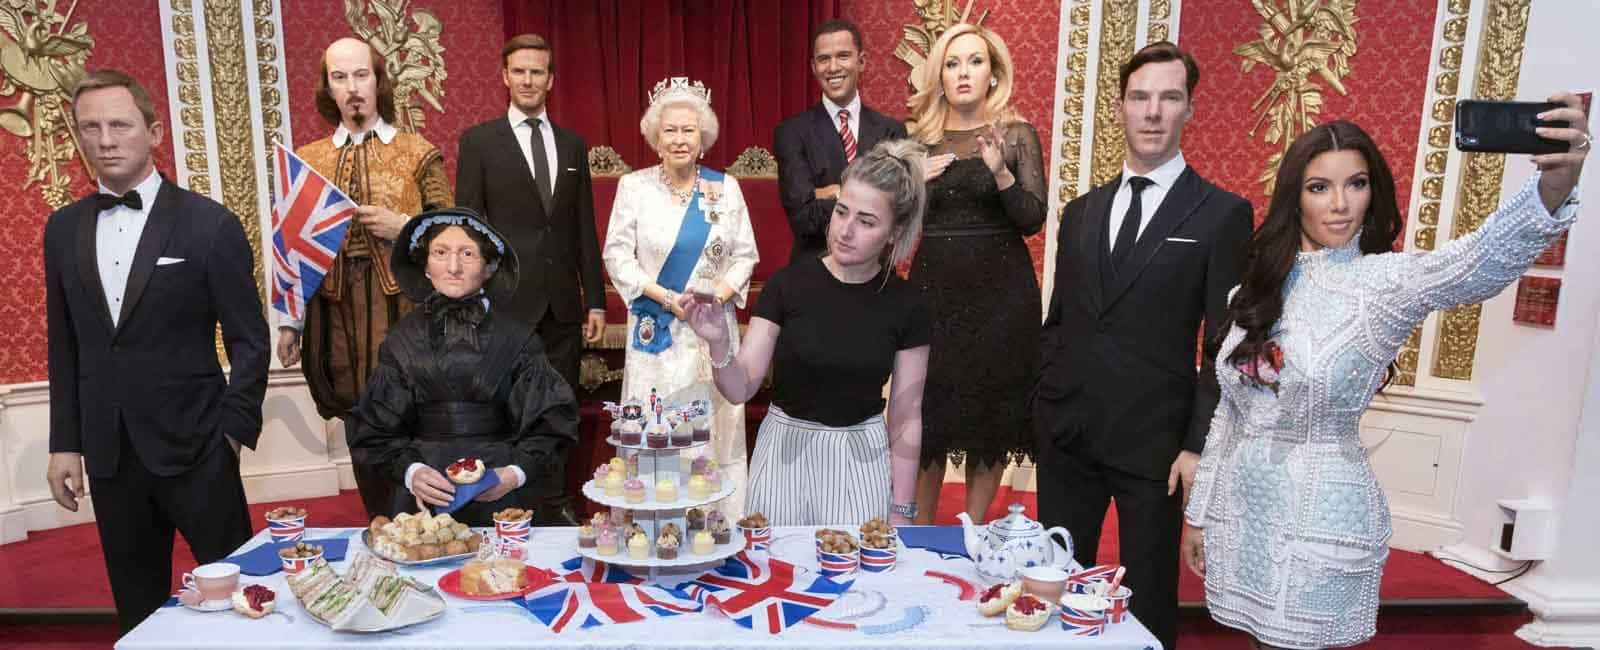 museo-madame-tussauds-londres celebra el cumpleaños de la reina isabel de inglaterra